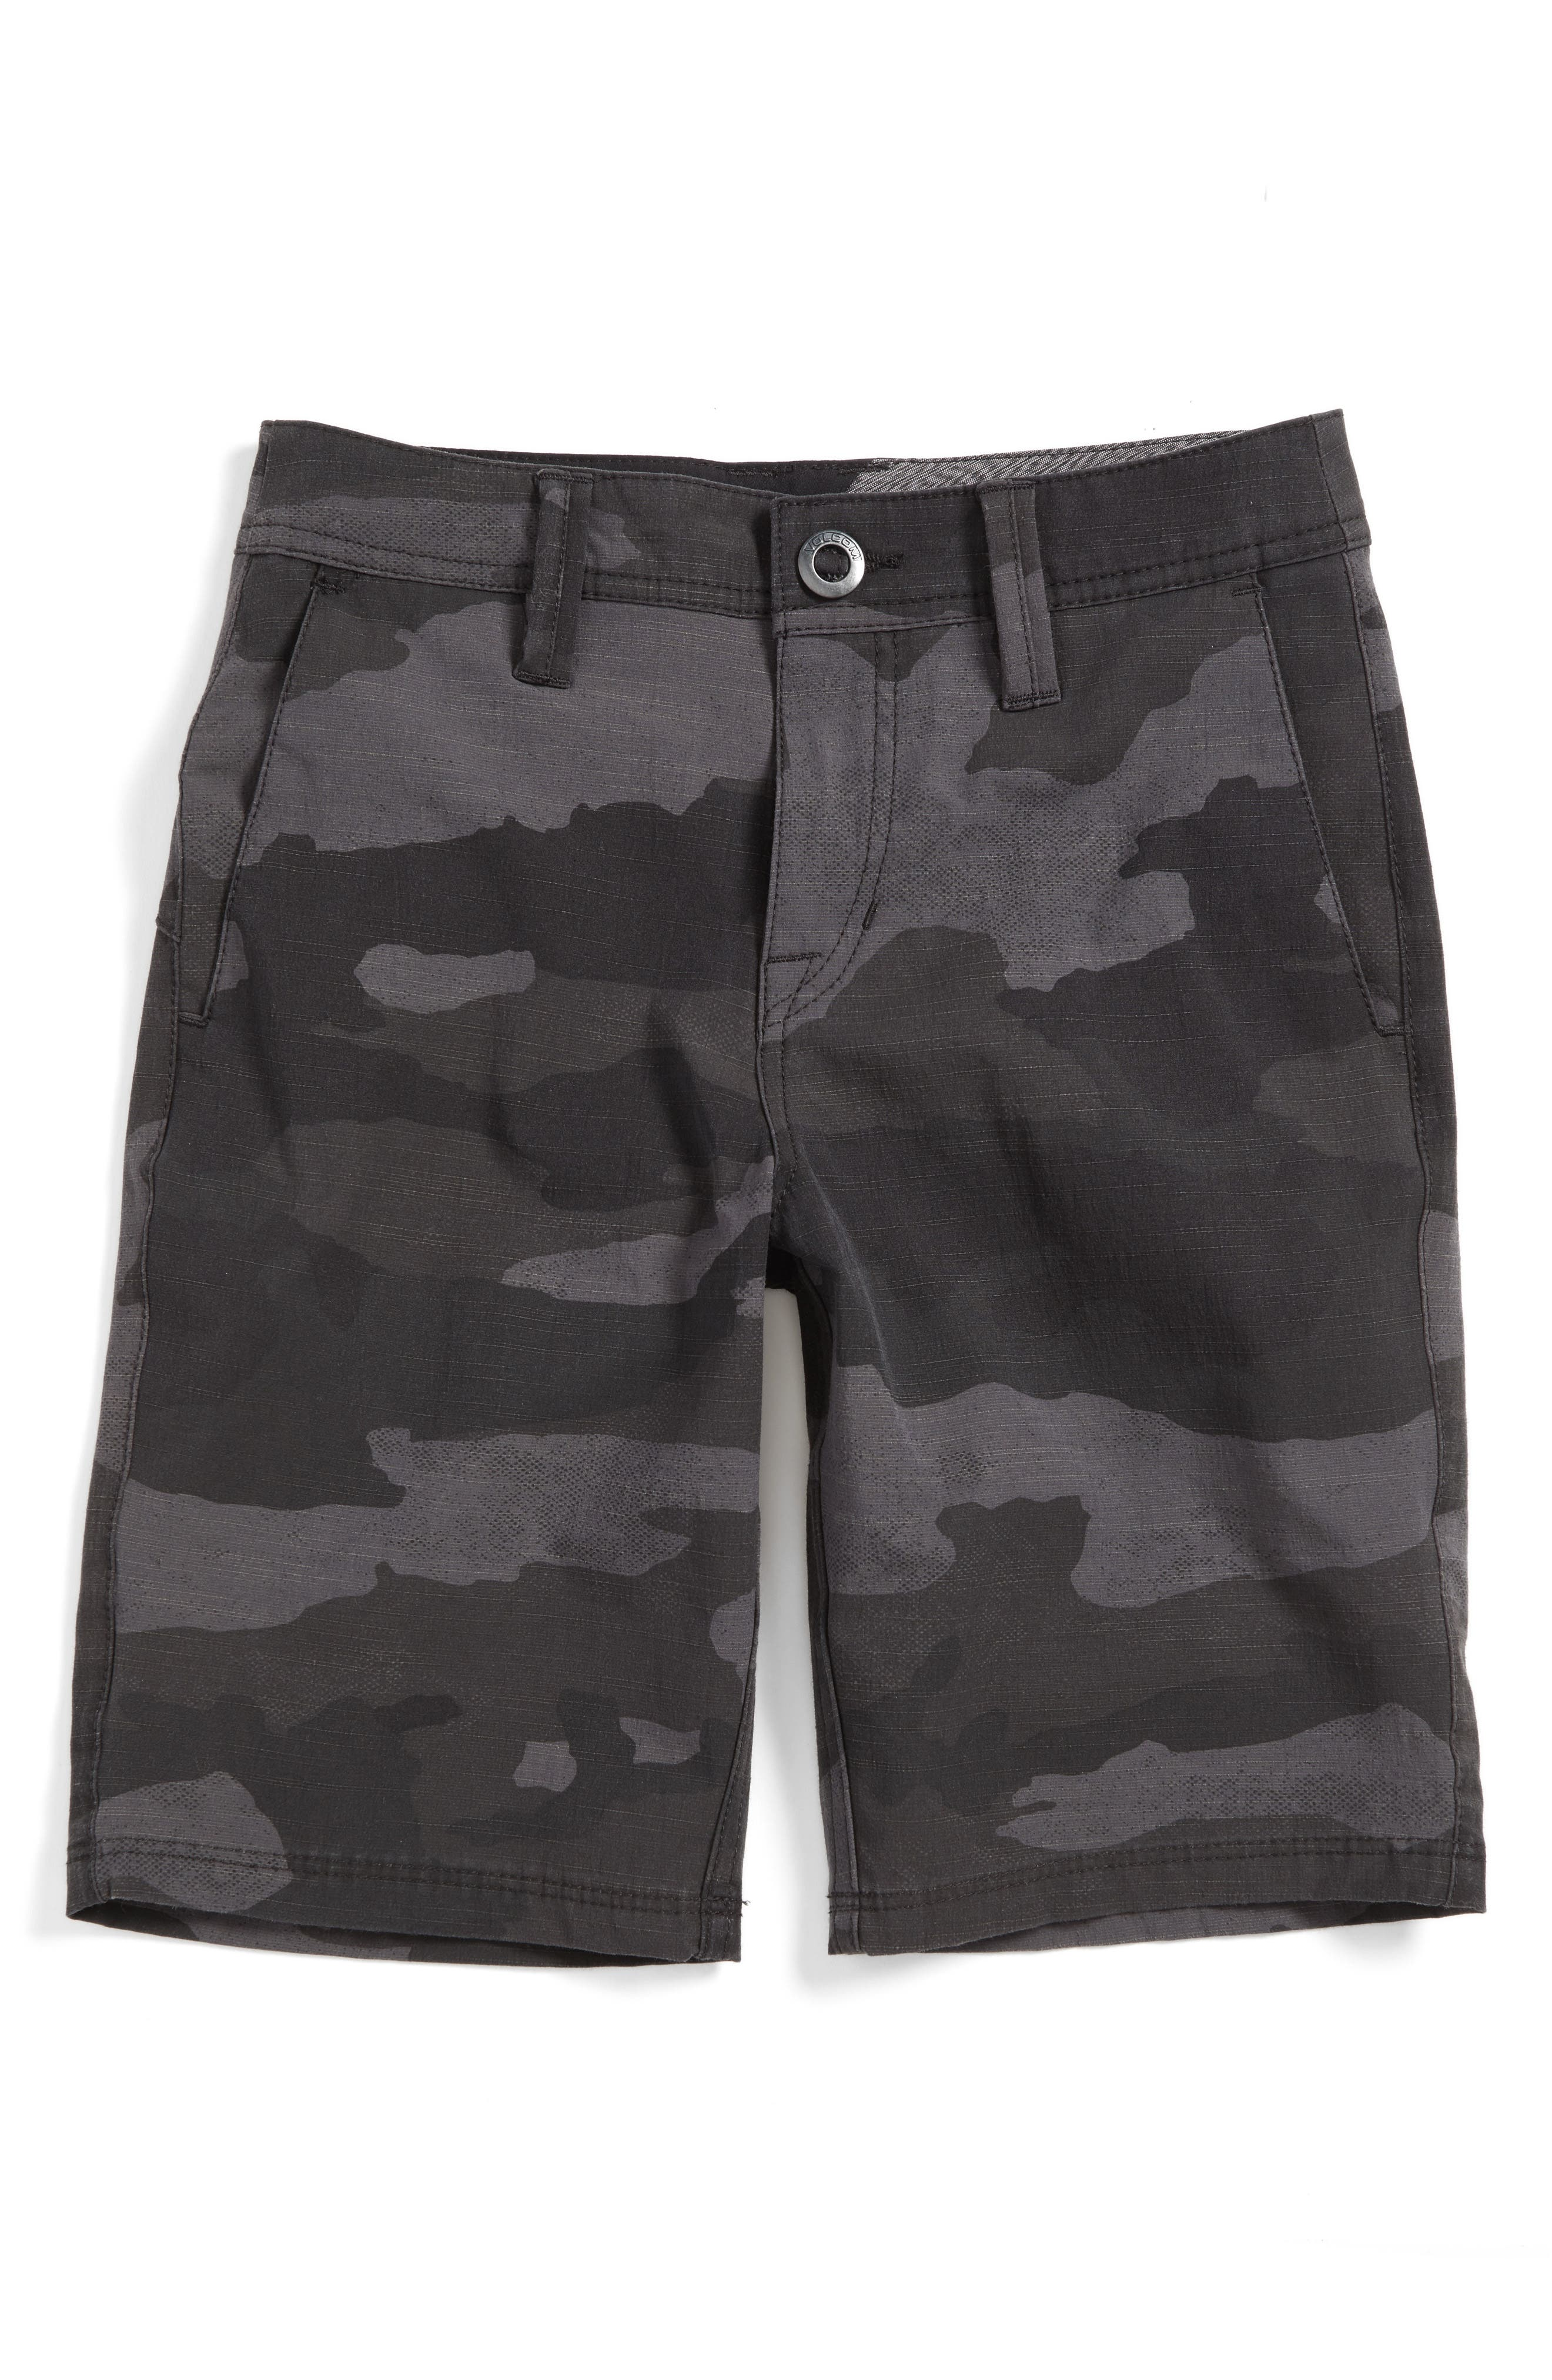 Surf N' Turf Hybrid Shorts,                             Main thumbnail 1, color,                             Black